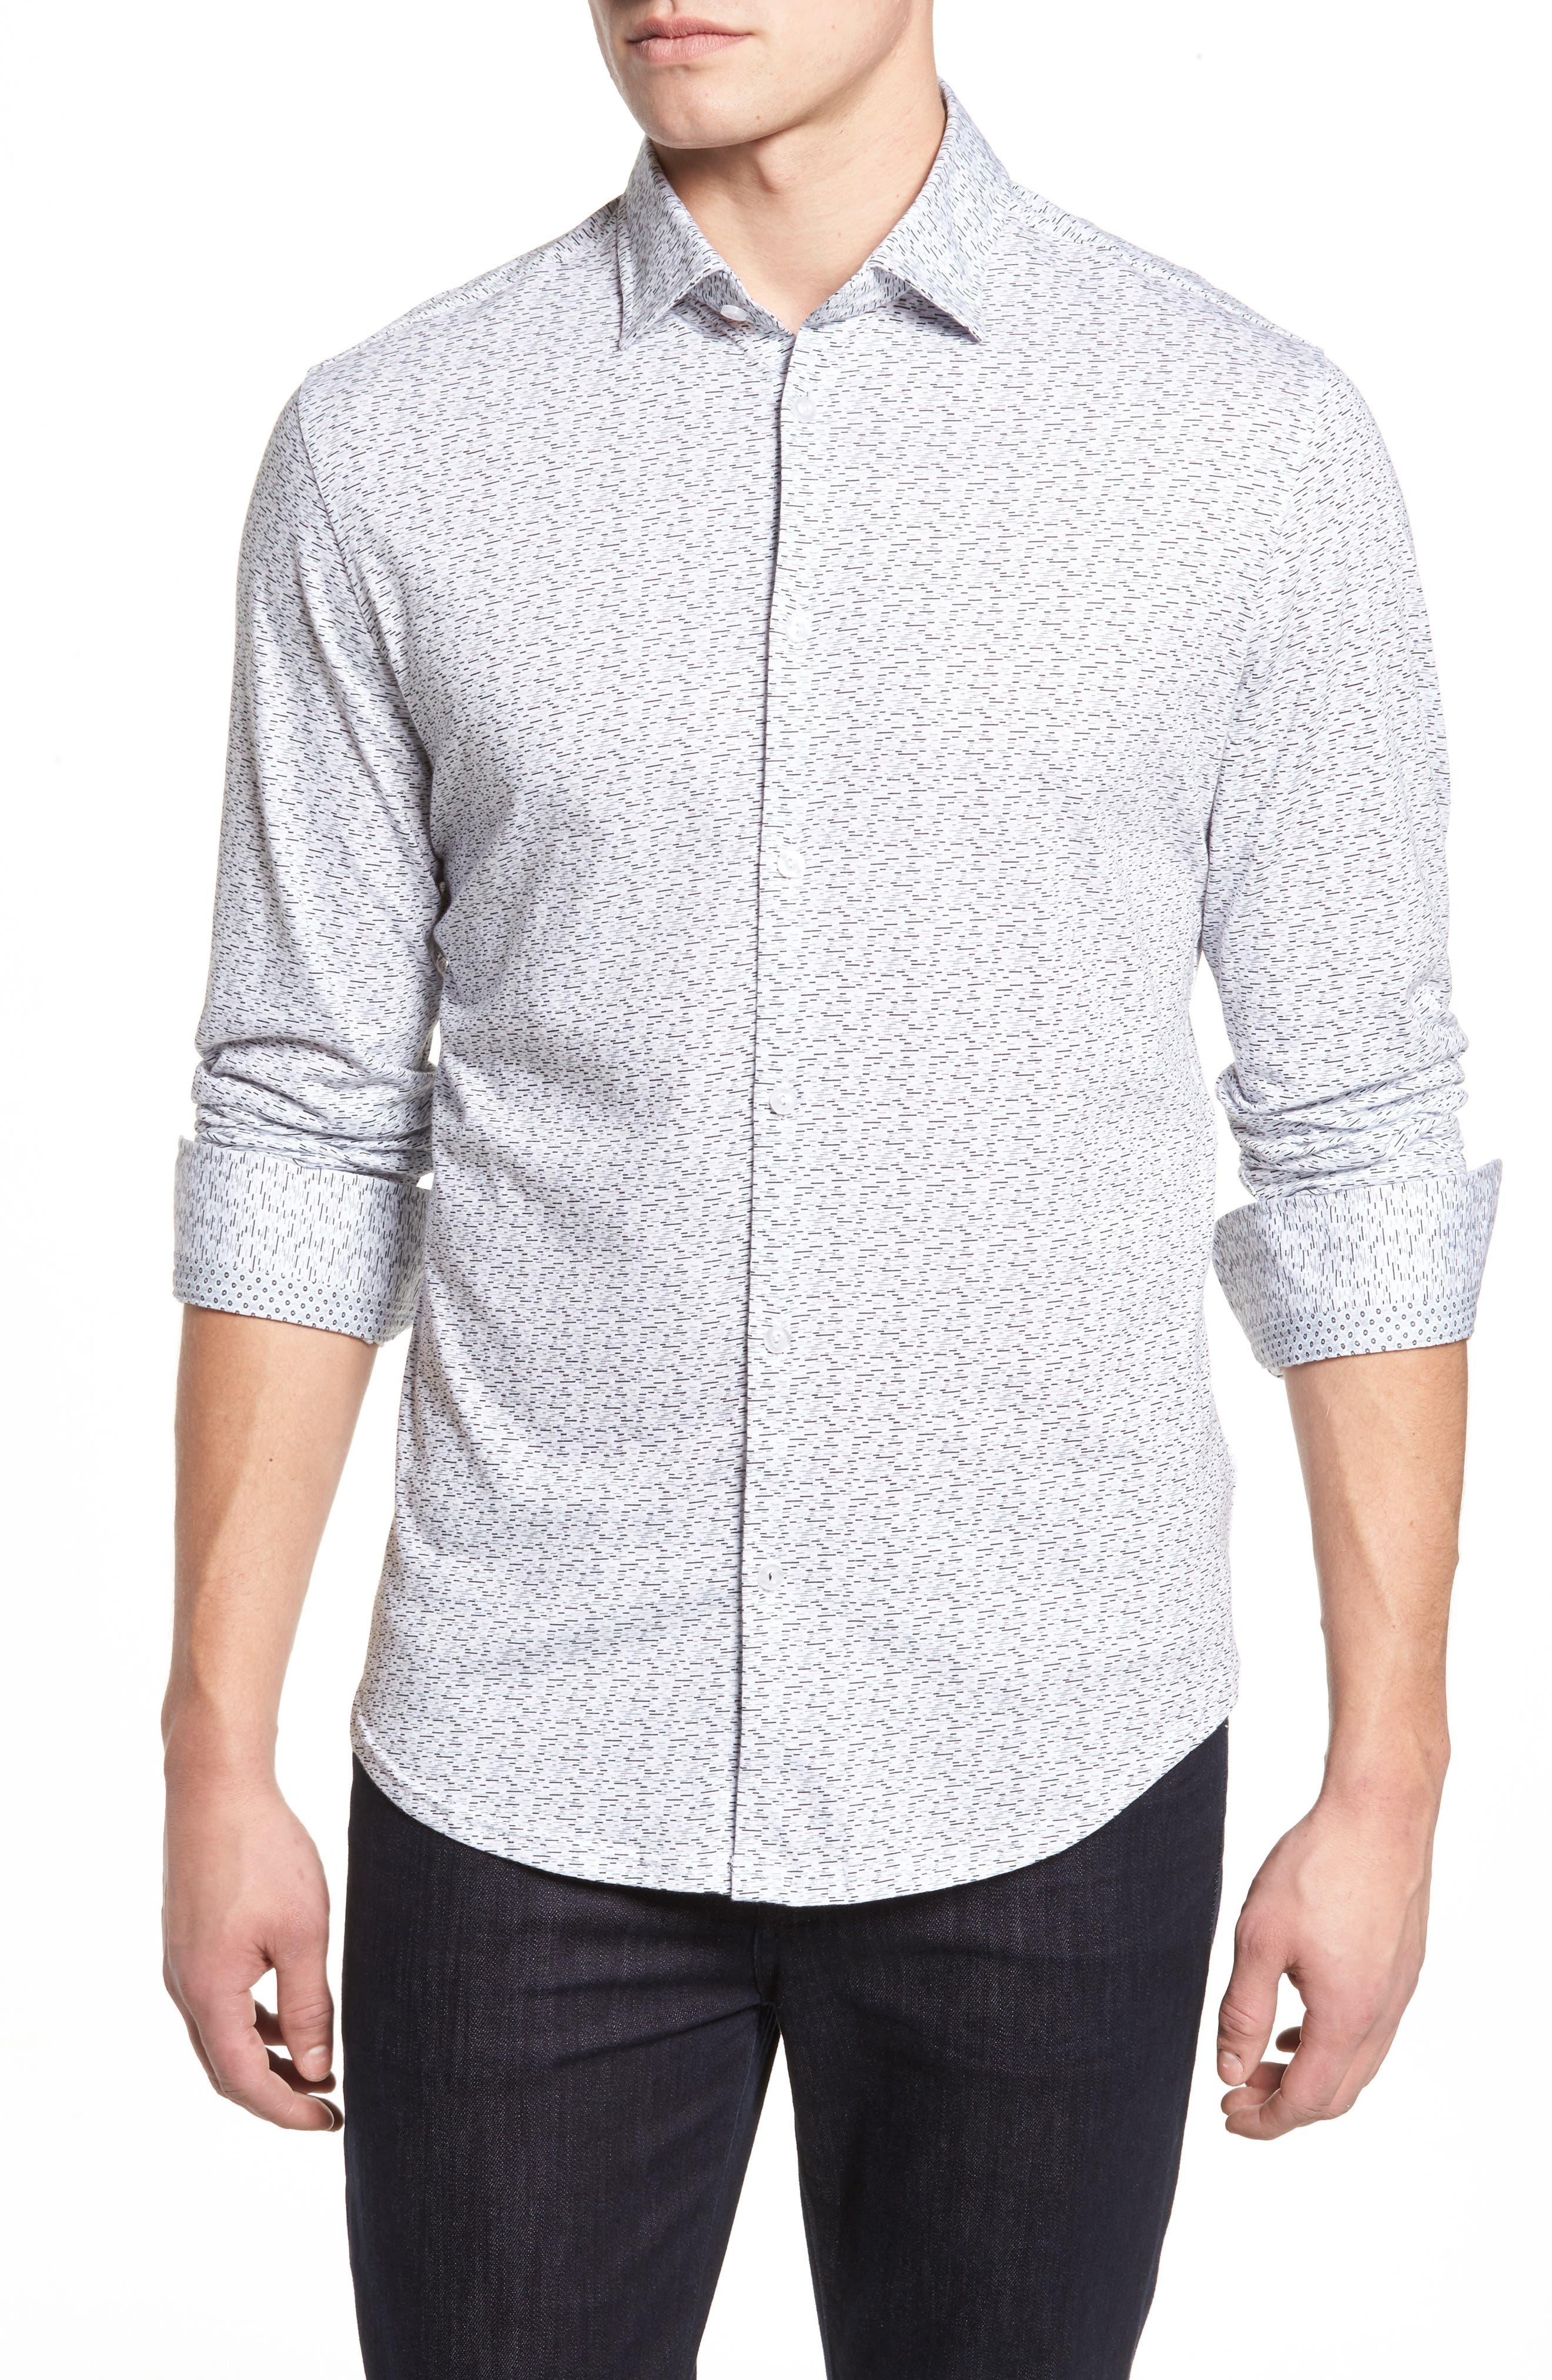 Main Image - Stone Rose Slim Fit Print Knit Sport Shirt